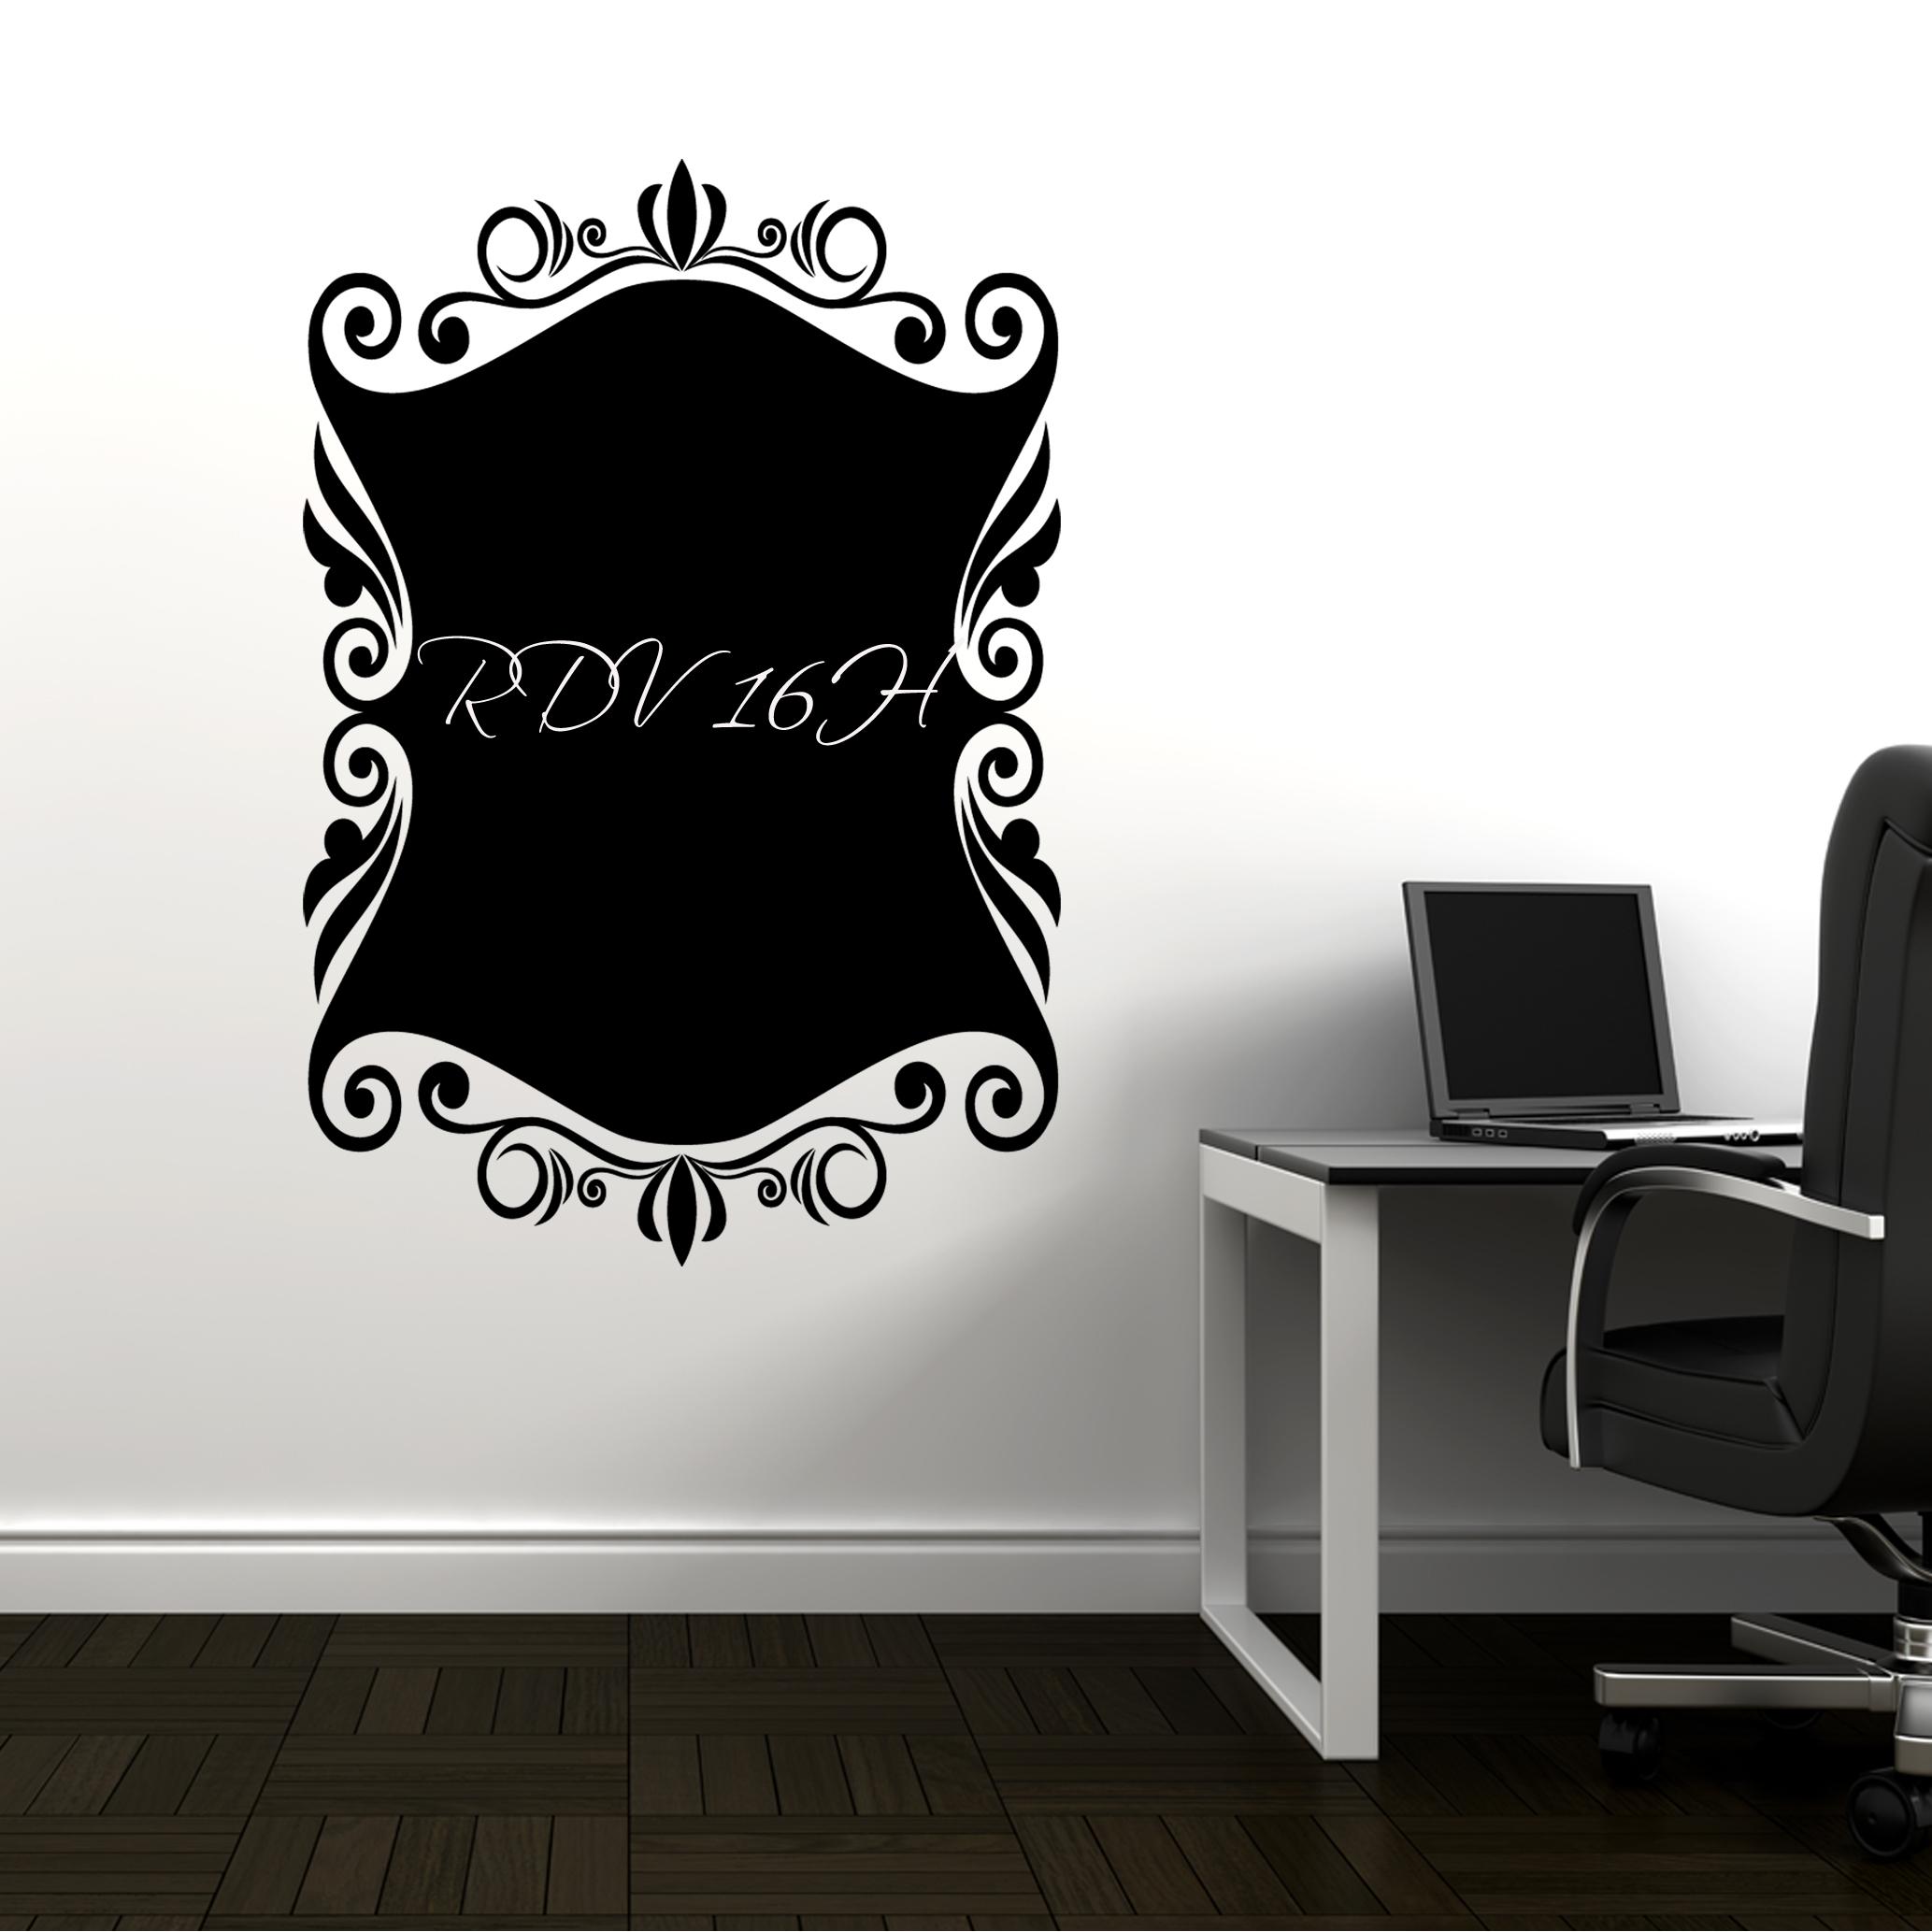 stickers ardoise ornement pas cher. Black Bedroom Furniture Sets. Home Design Ideas